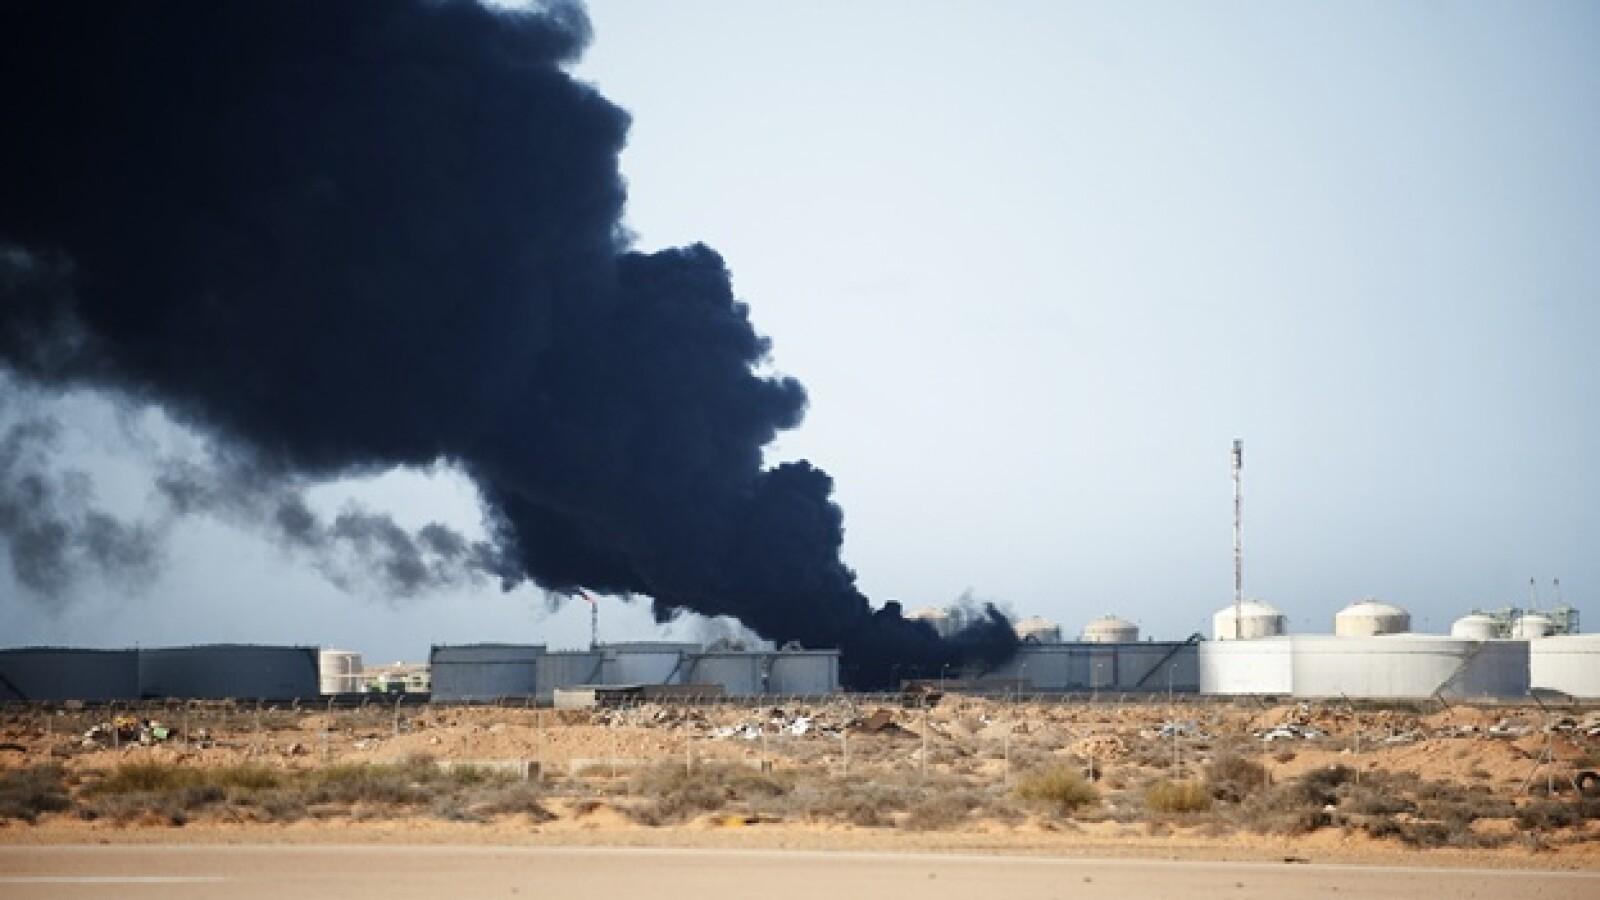 Libia - refinería incendiada